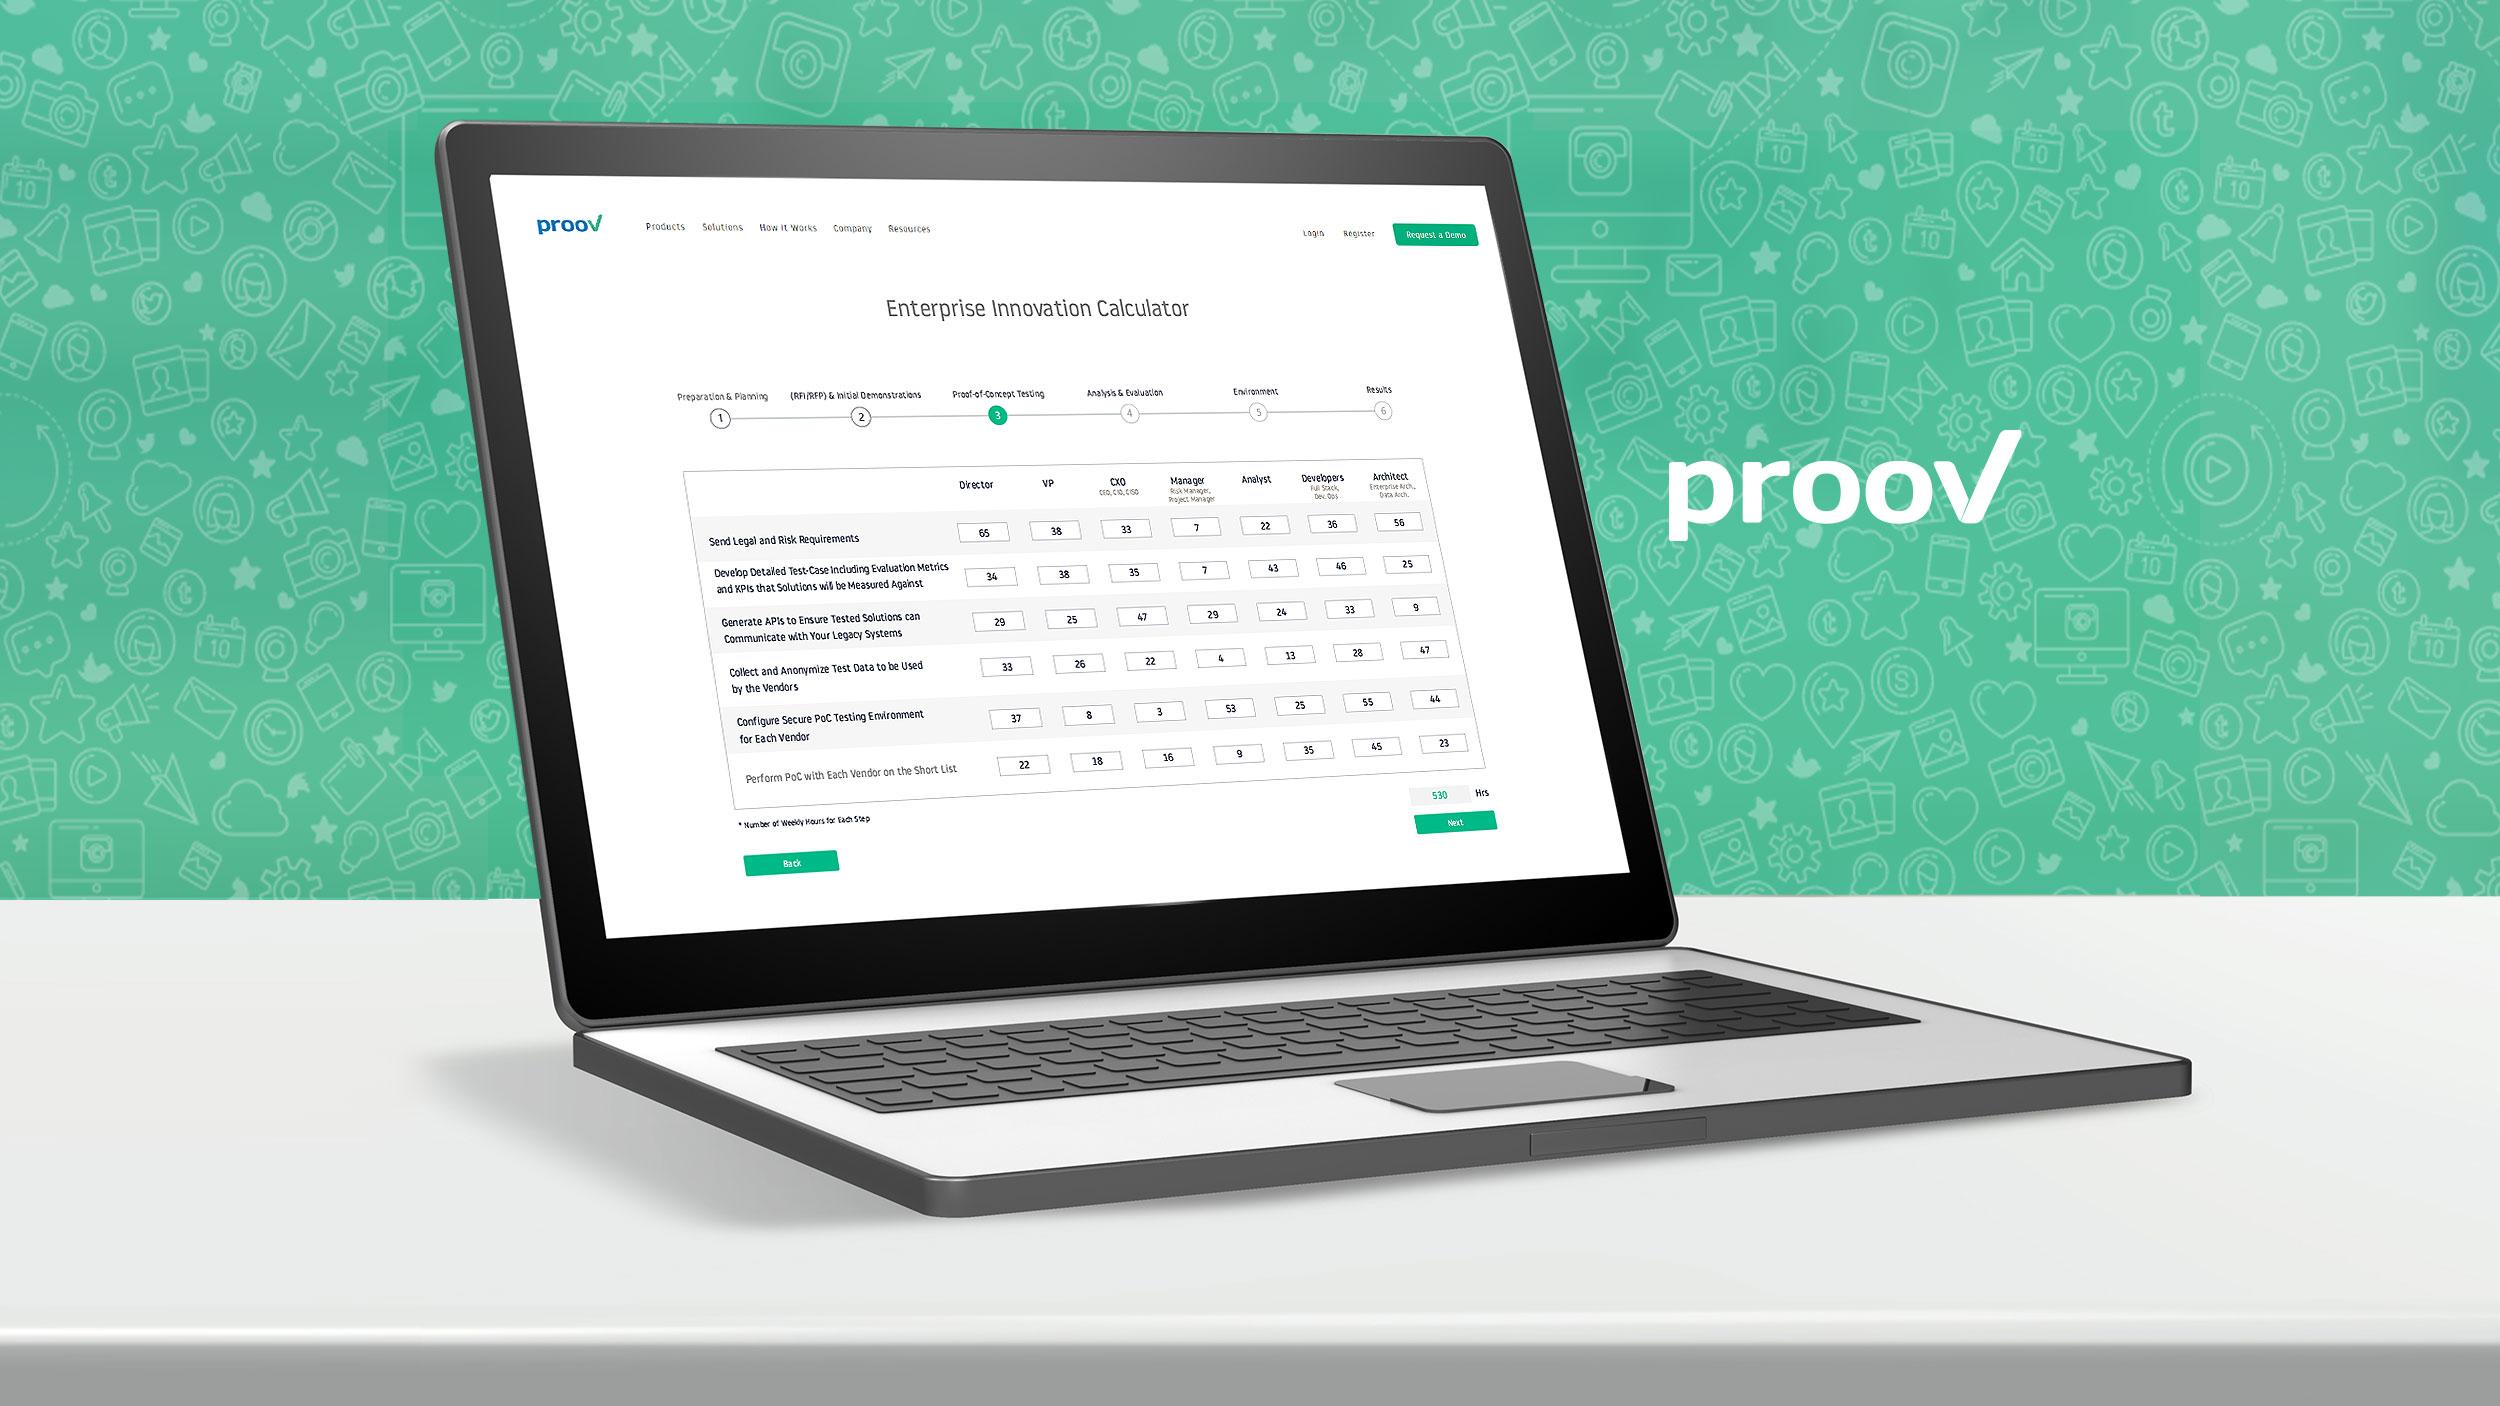 prooV innovation calculator